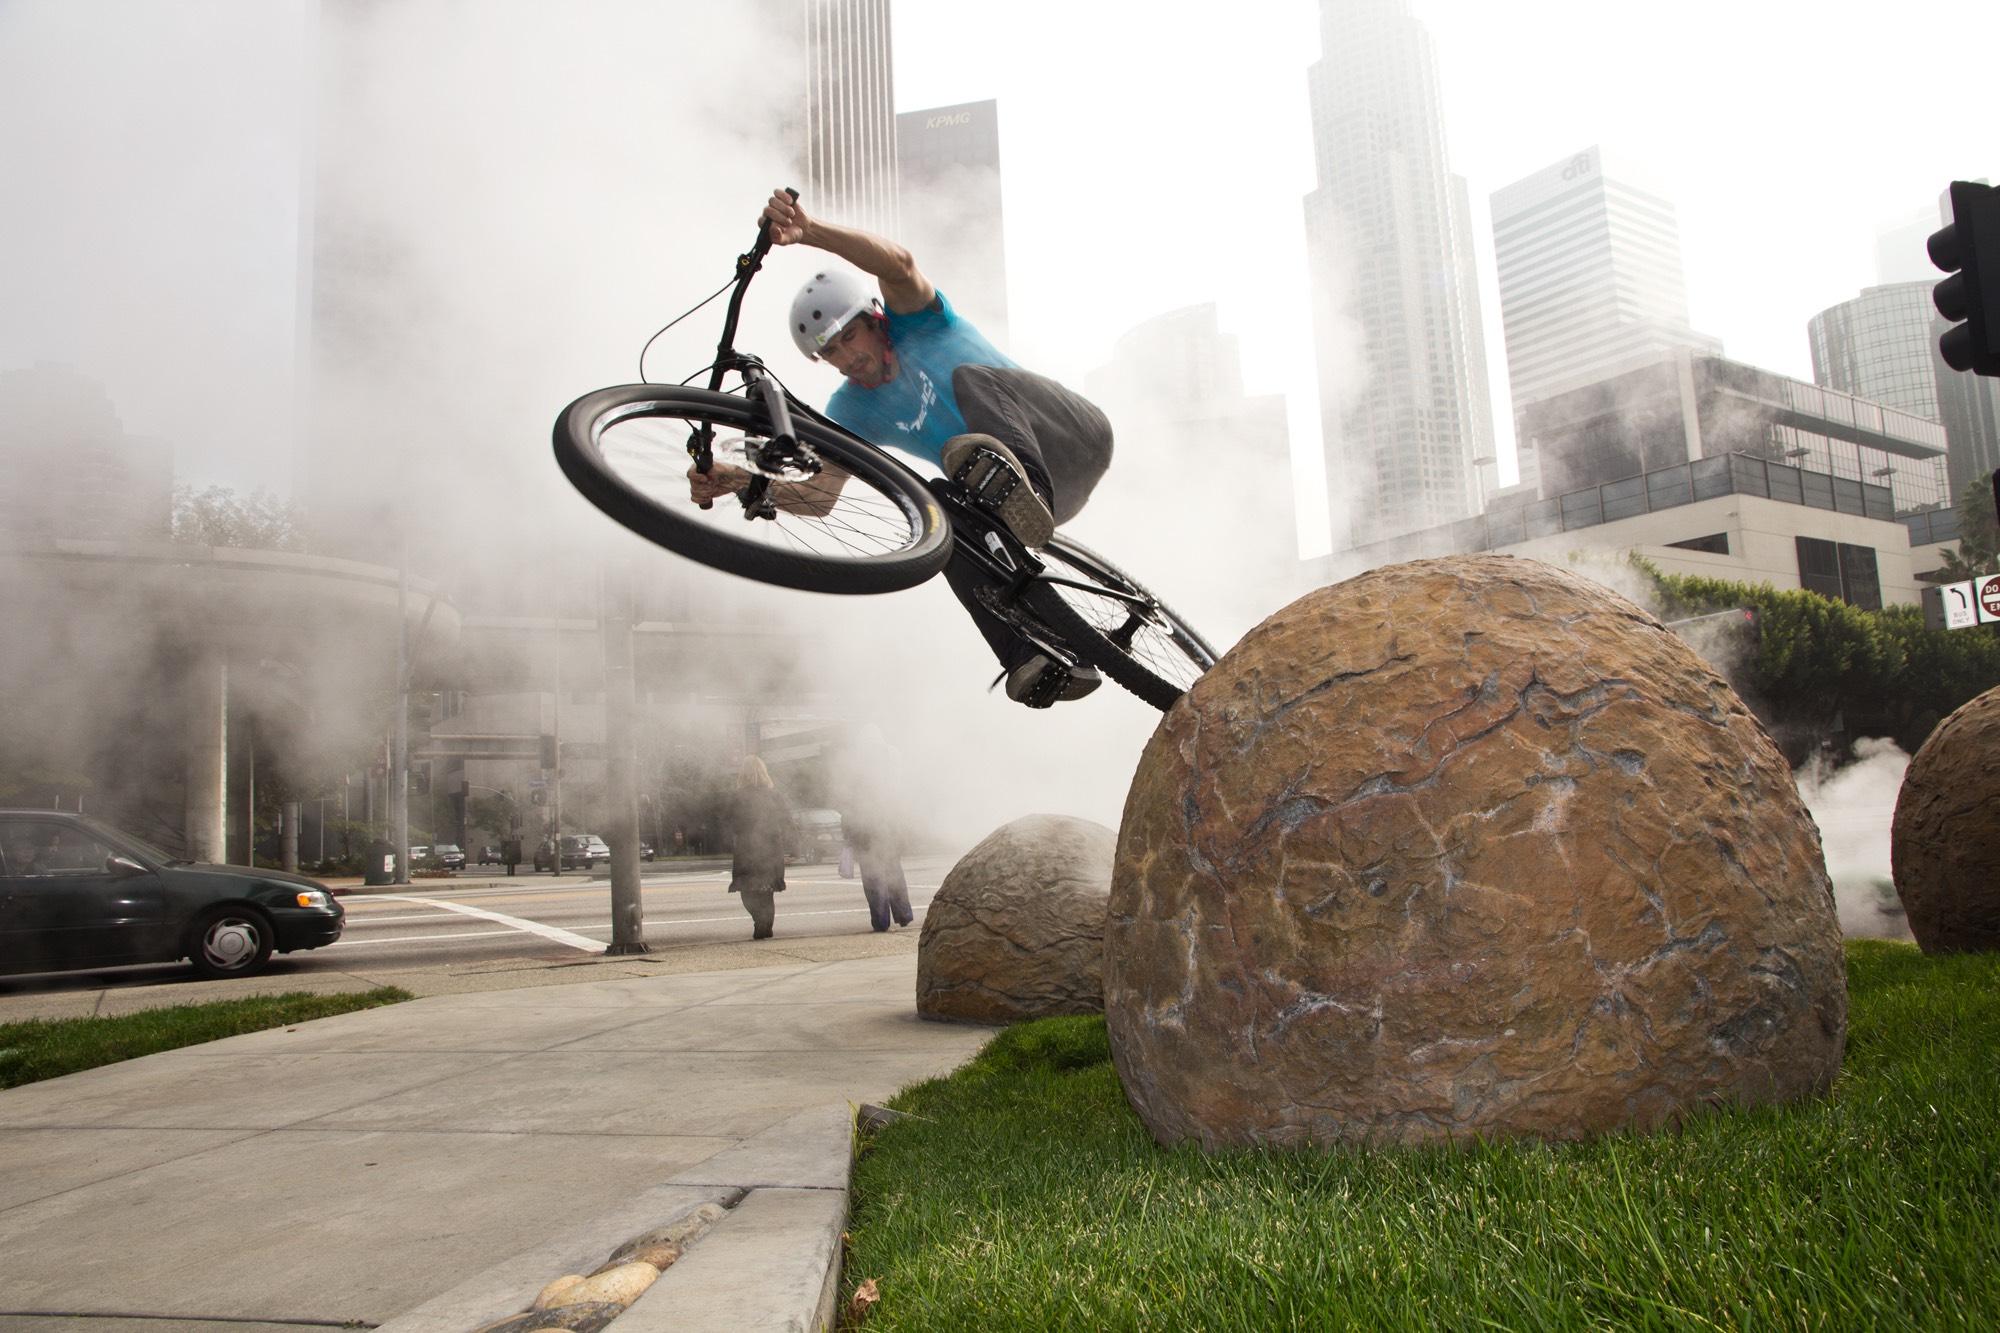 Dominik Raab springt mit dem Hinterrad gegen einen Felsen in Los Angeles